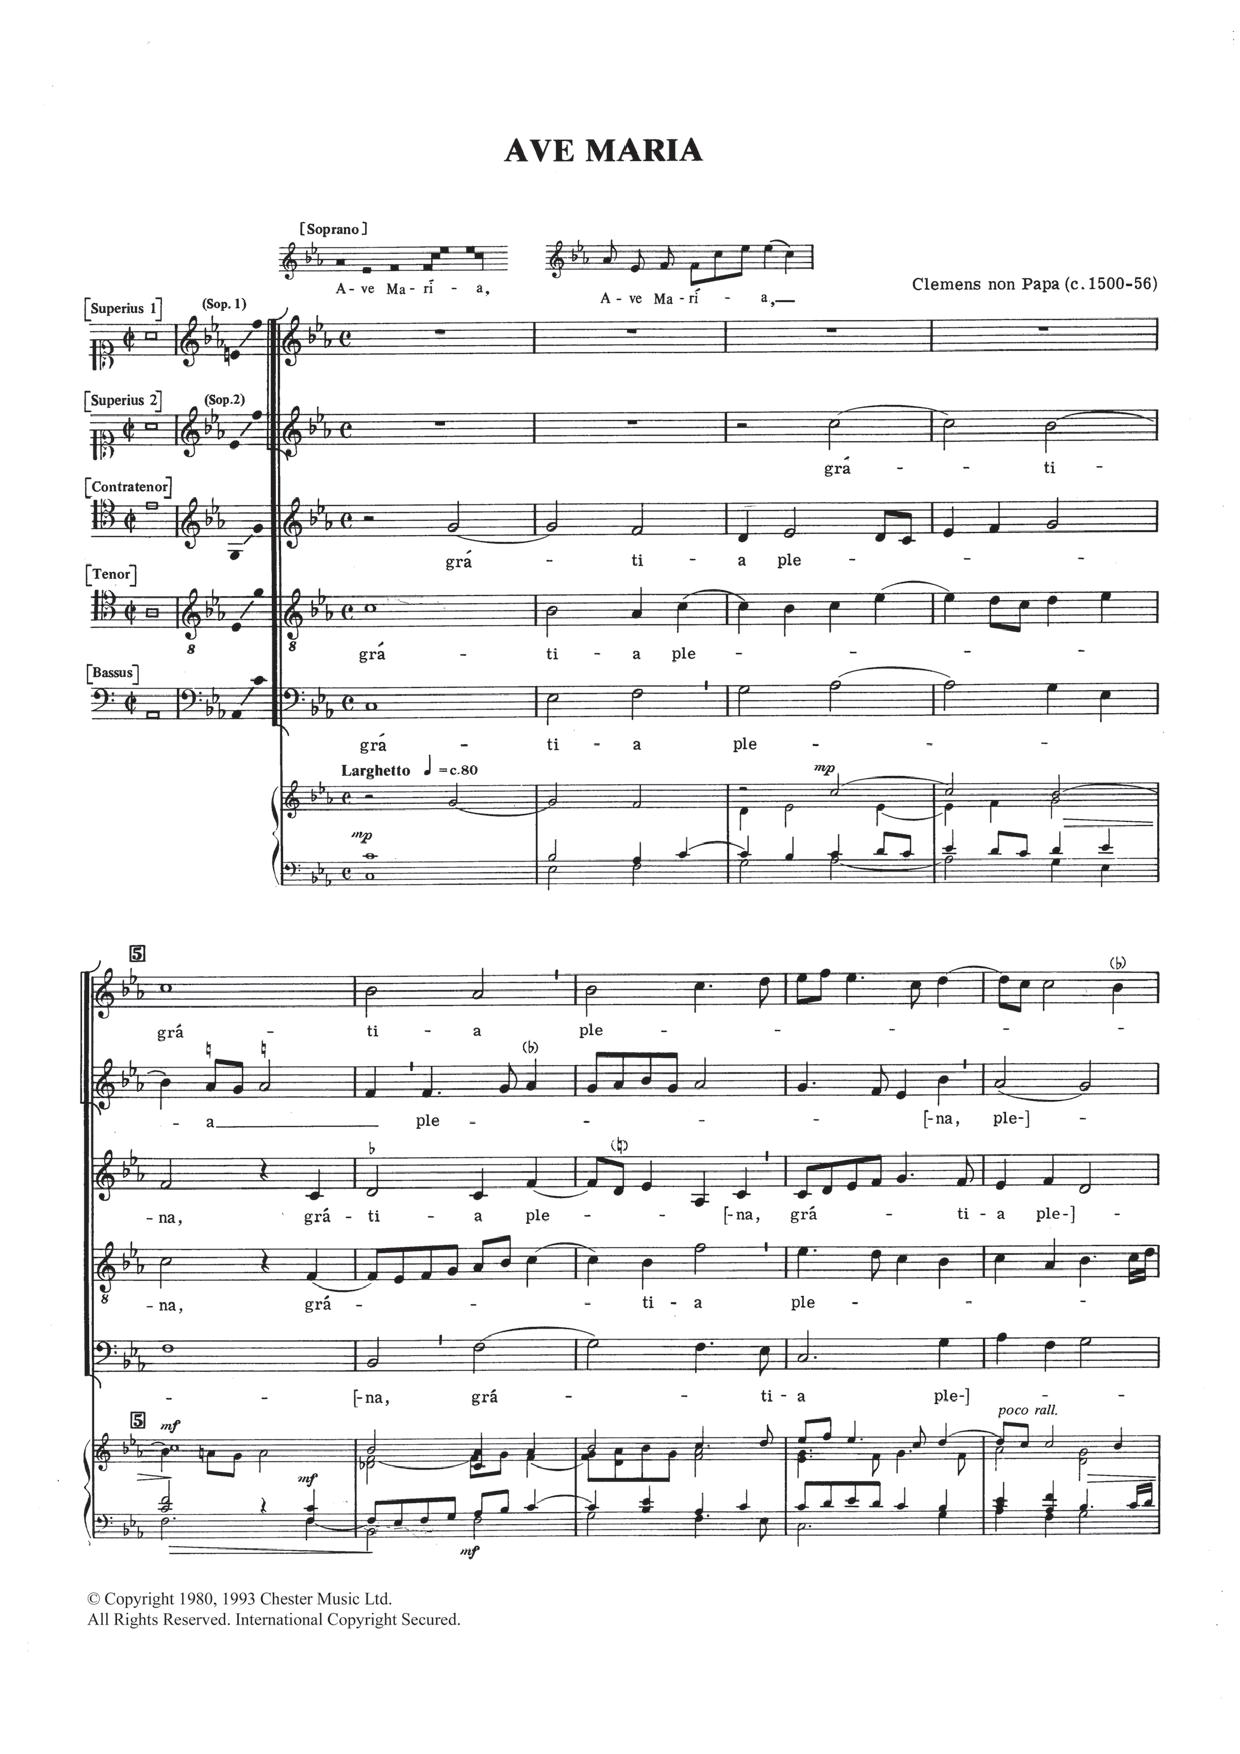 Jacob Clemens Non Papa - Ave Maria